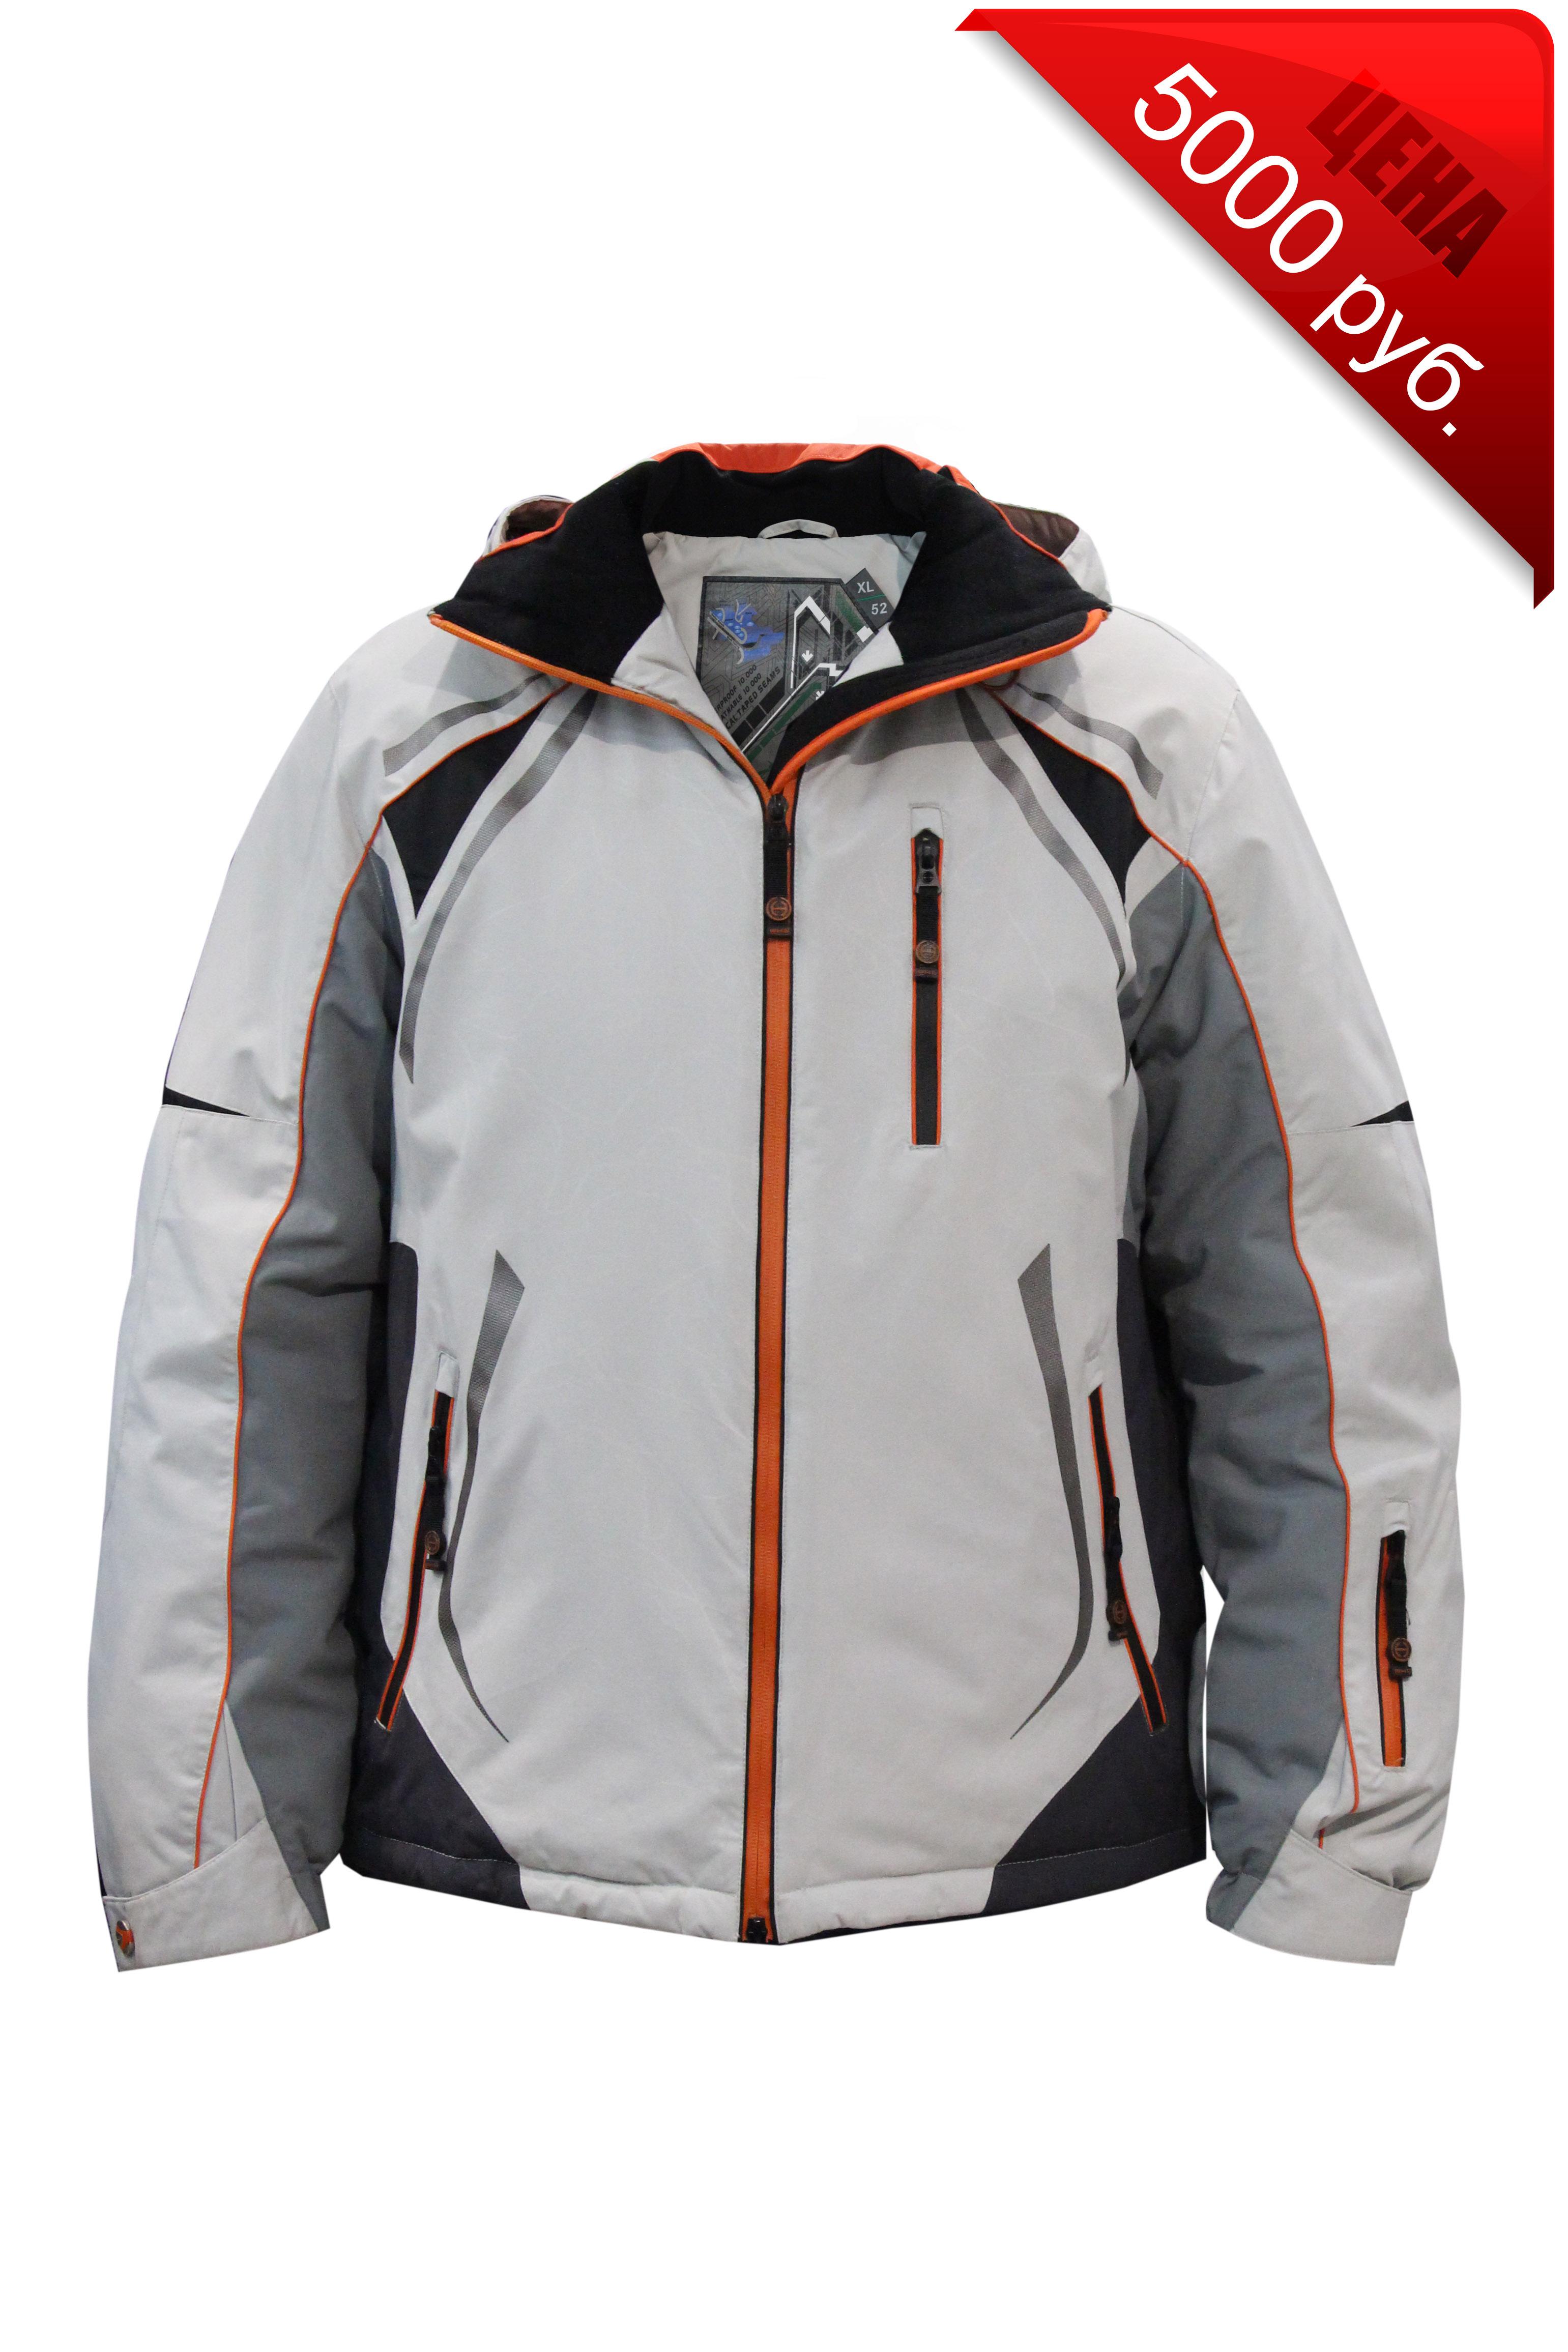 Спортивная куртка с климат-контролем Санкт-Петербург BriksTon